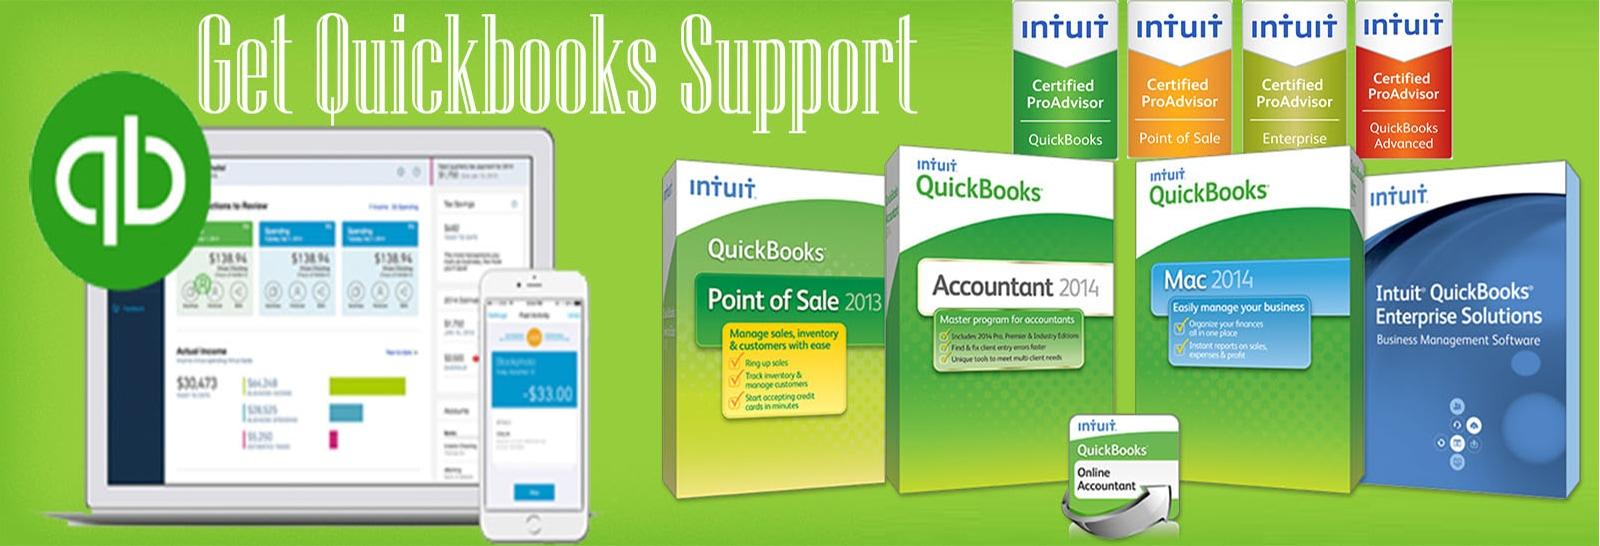 QuickBooks Support Number, Latest News Adda